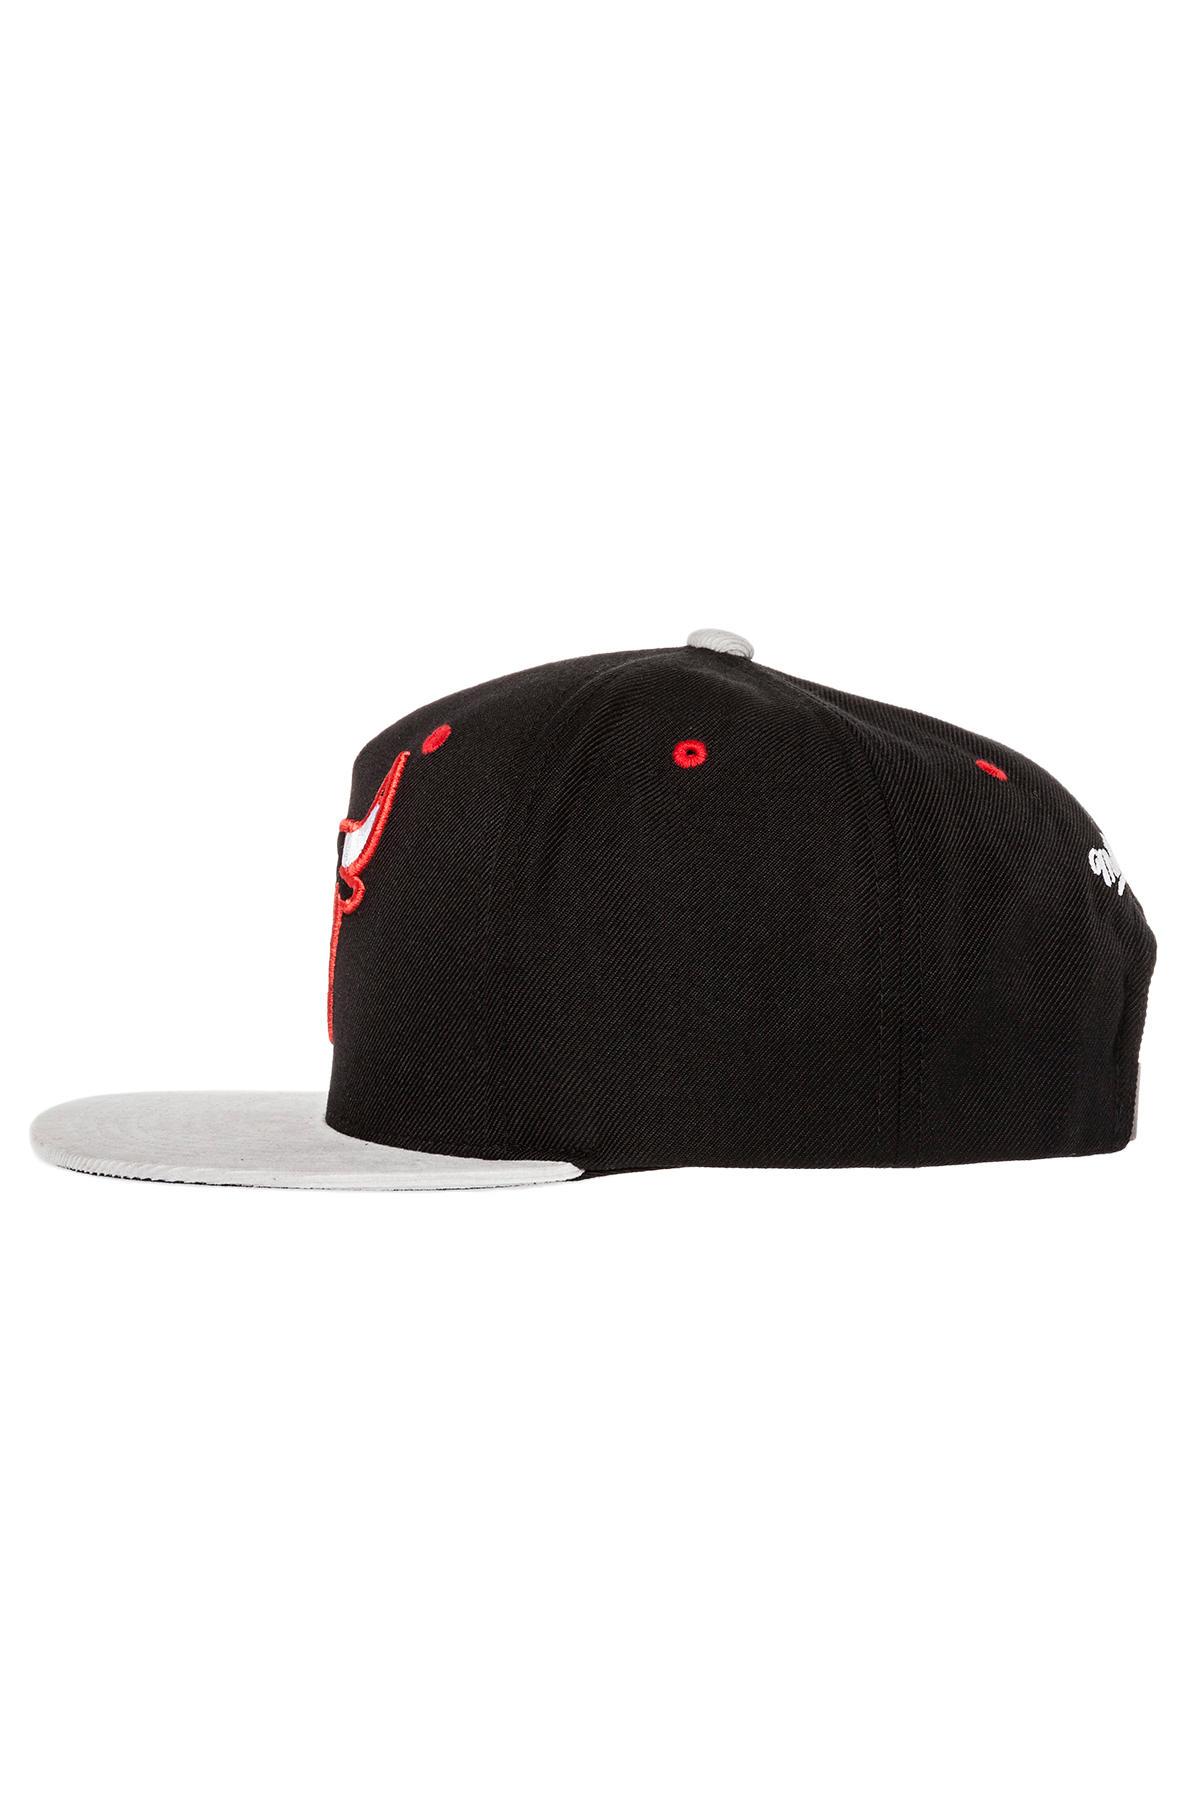 24b9a4afd2e Lyst - Mitchell   Ness The Chicago Bulls Grey Cord Visor Strapback ...